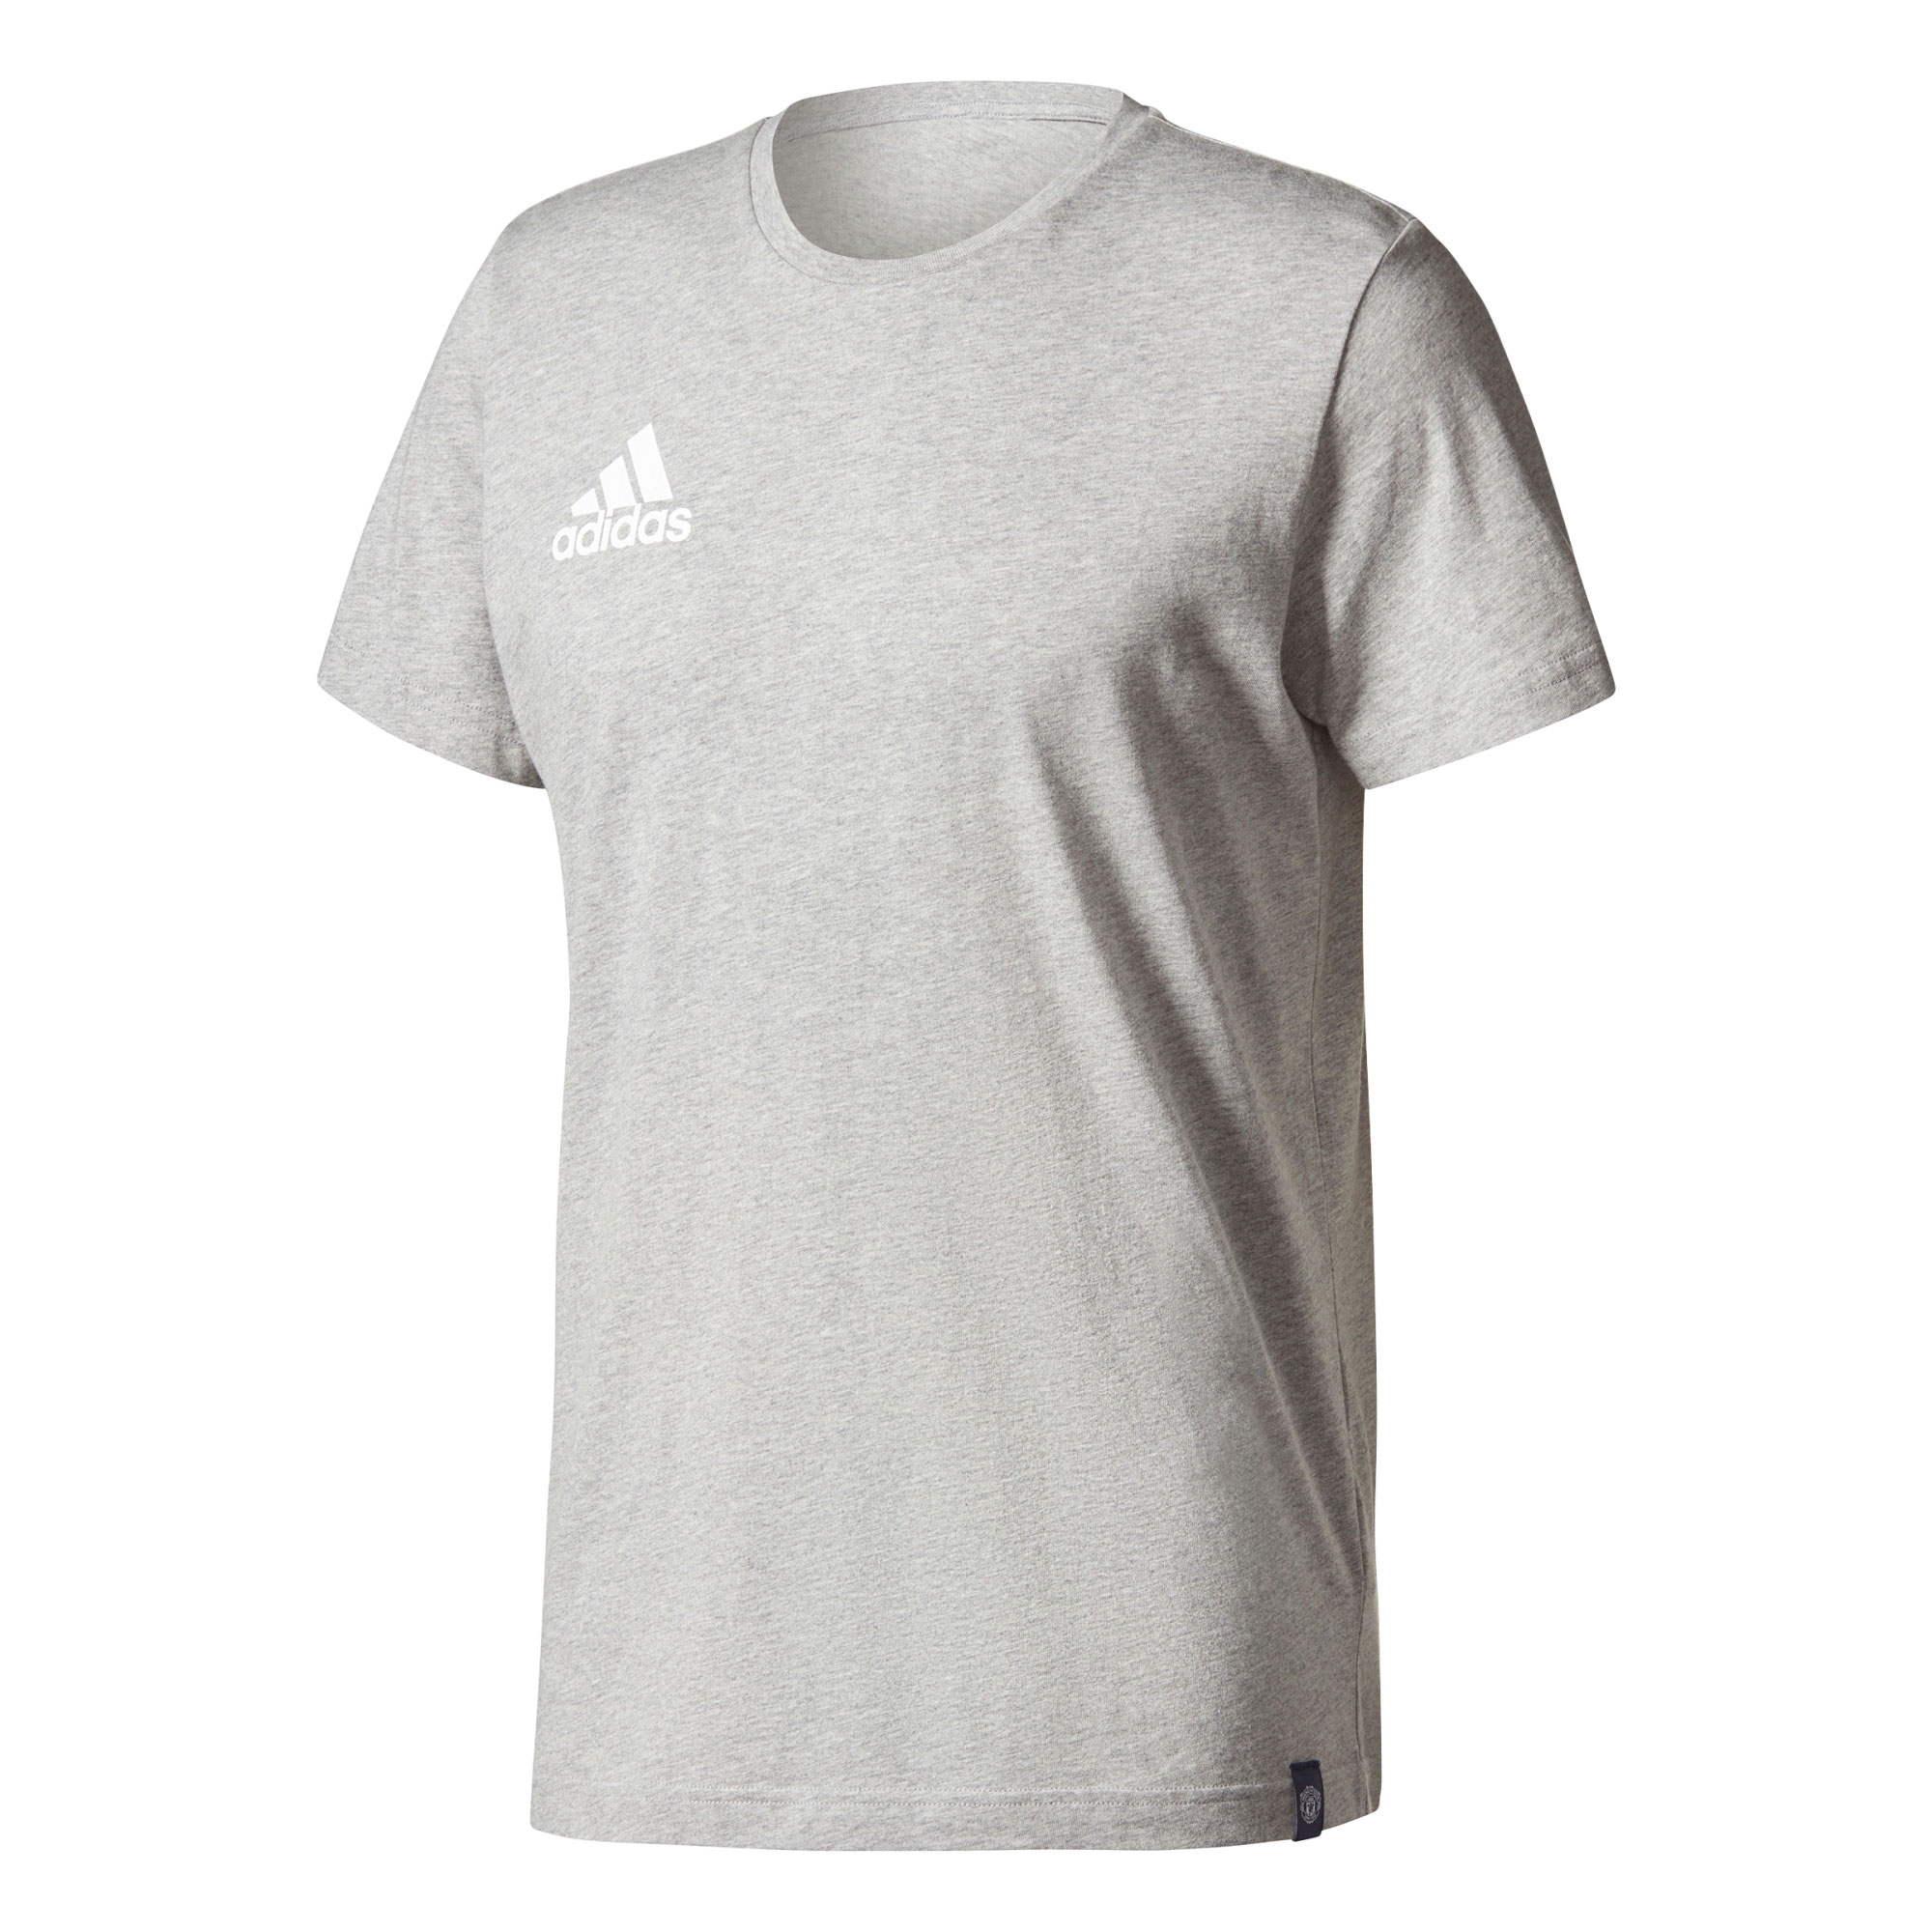 Manchester United T-Shirt - Grey - White